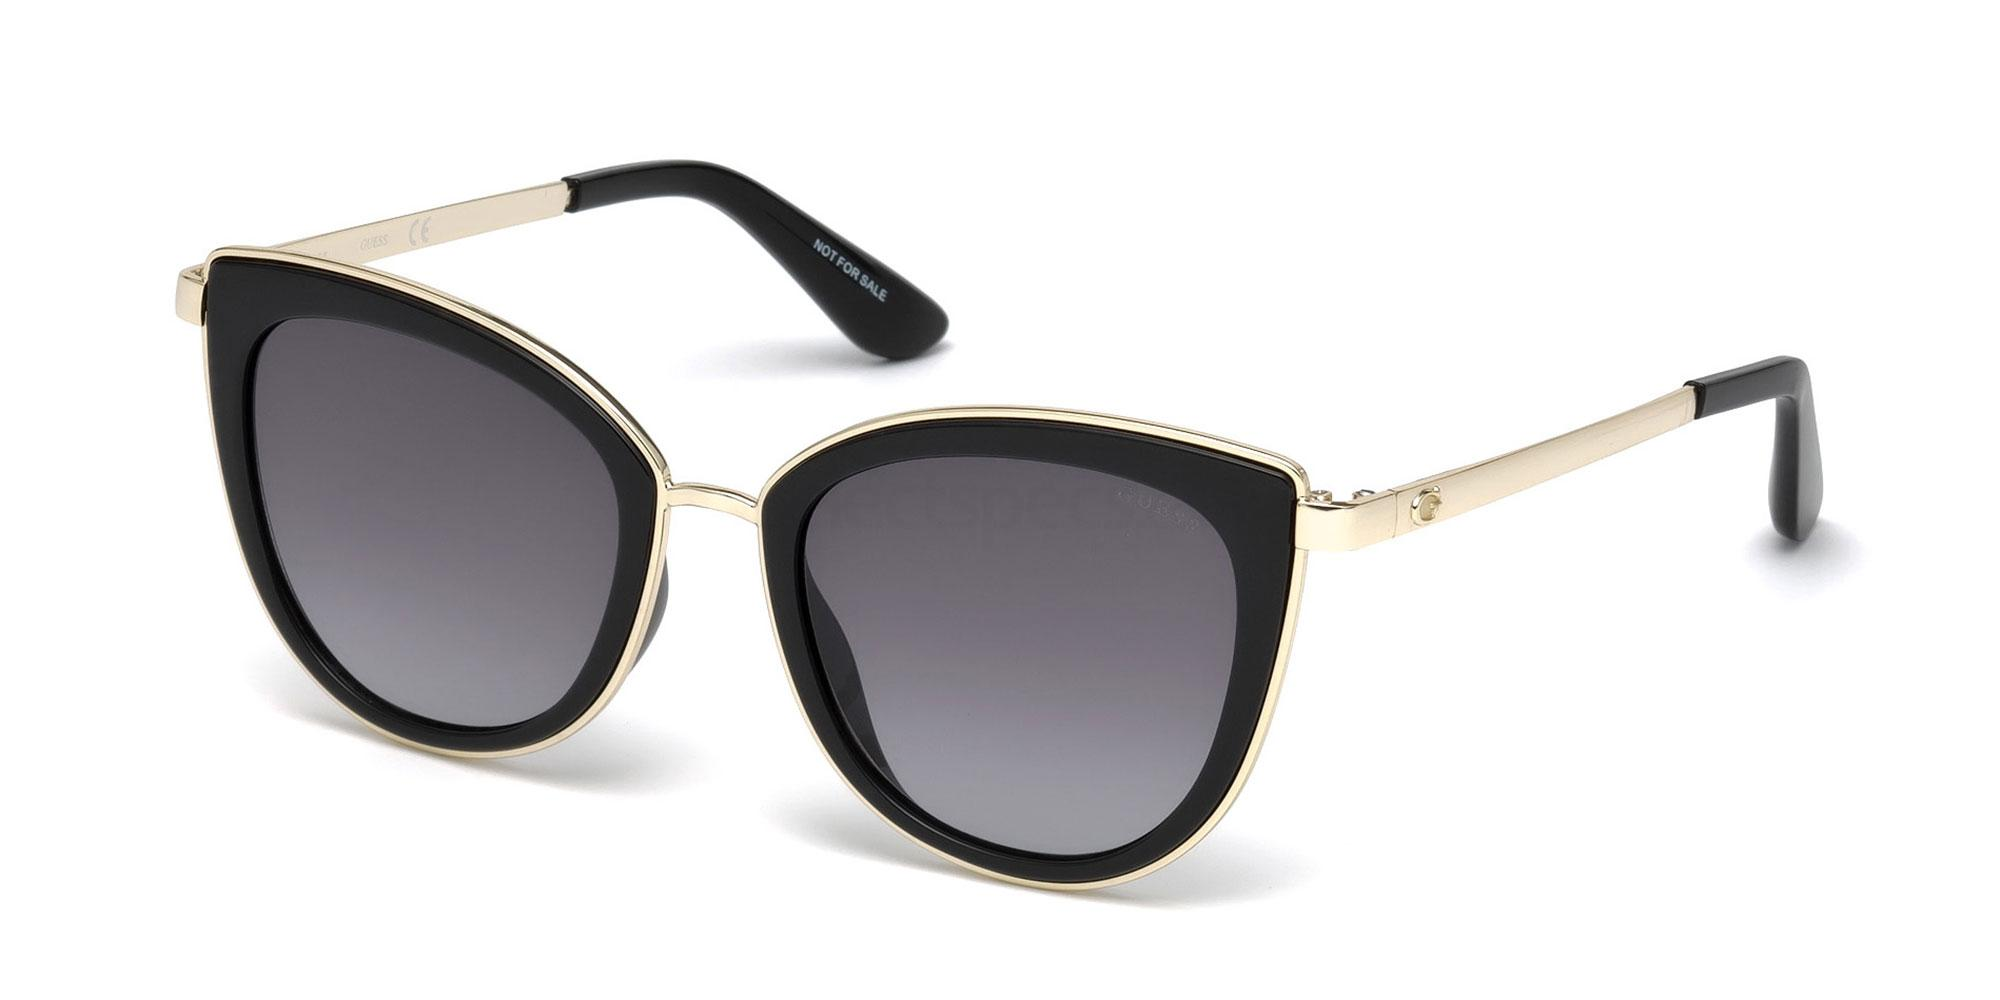 01B GU7491 Sunglasses, Guess